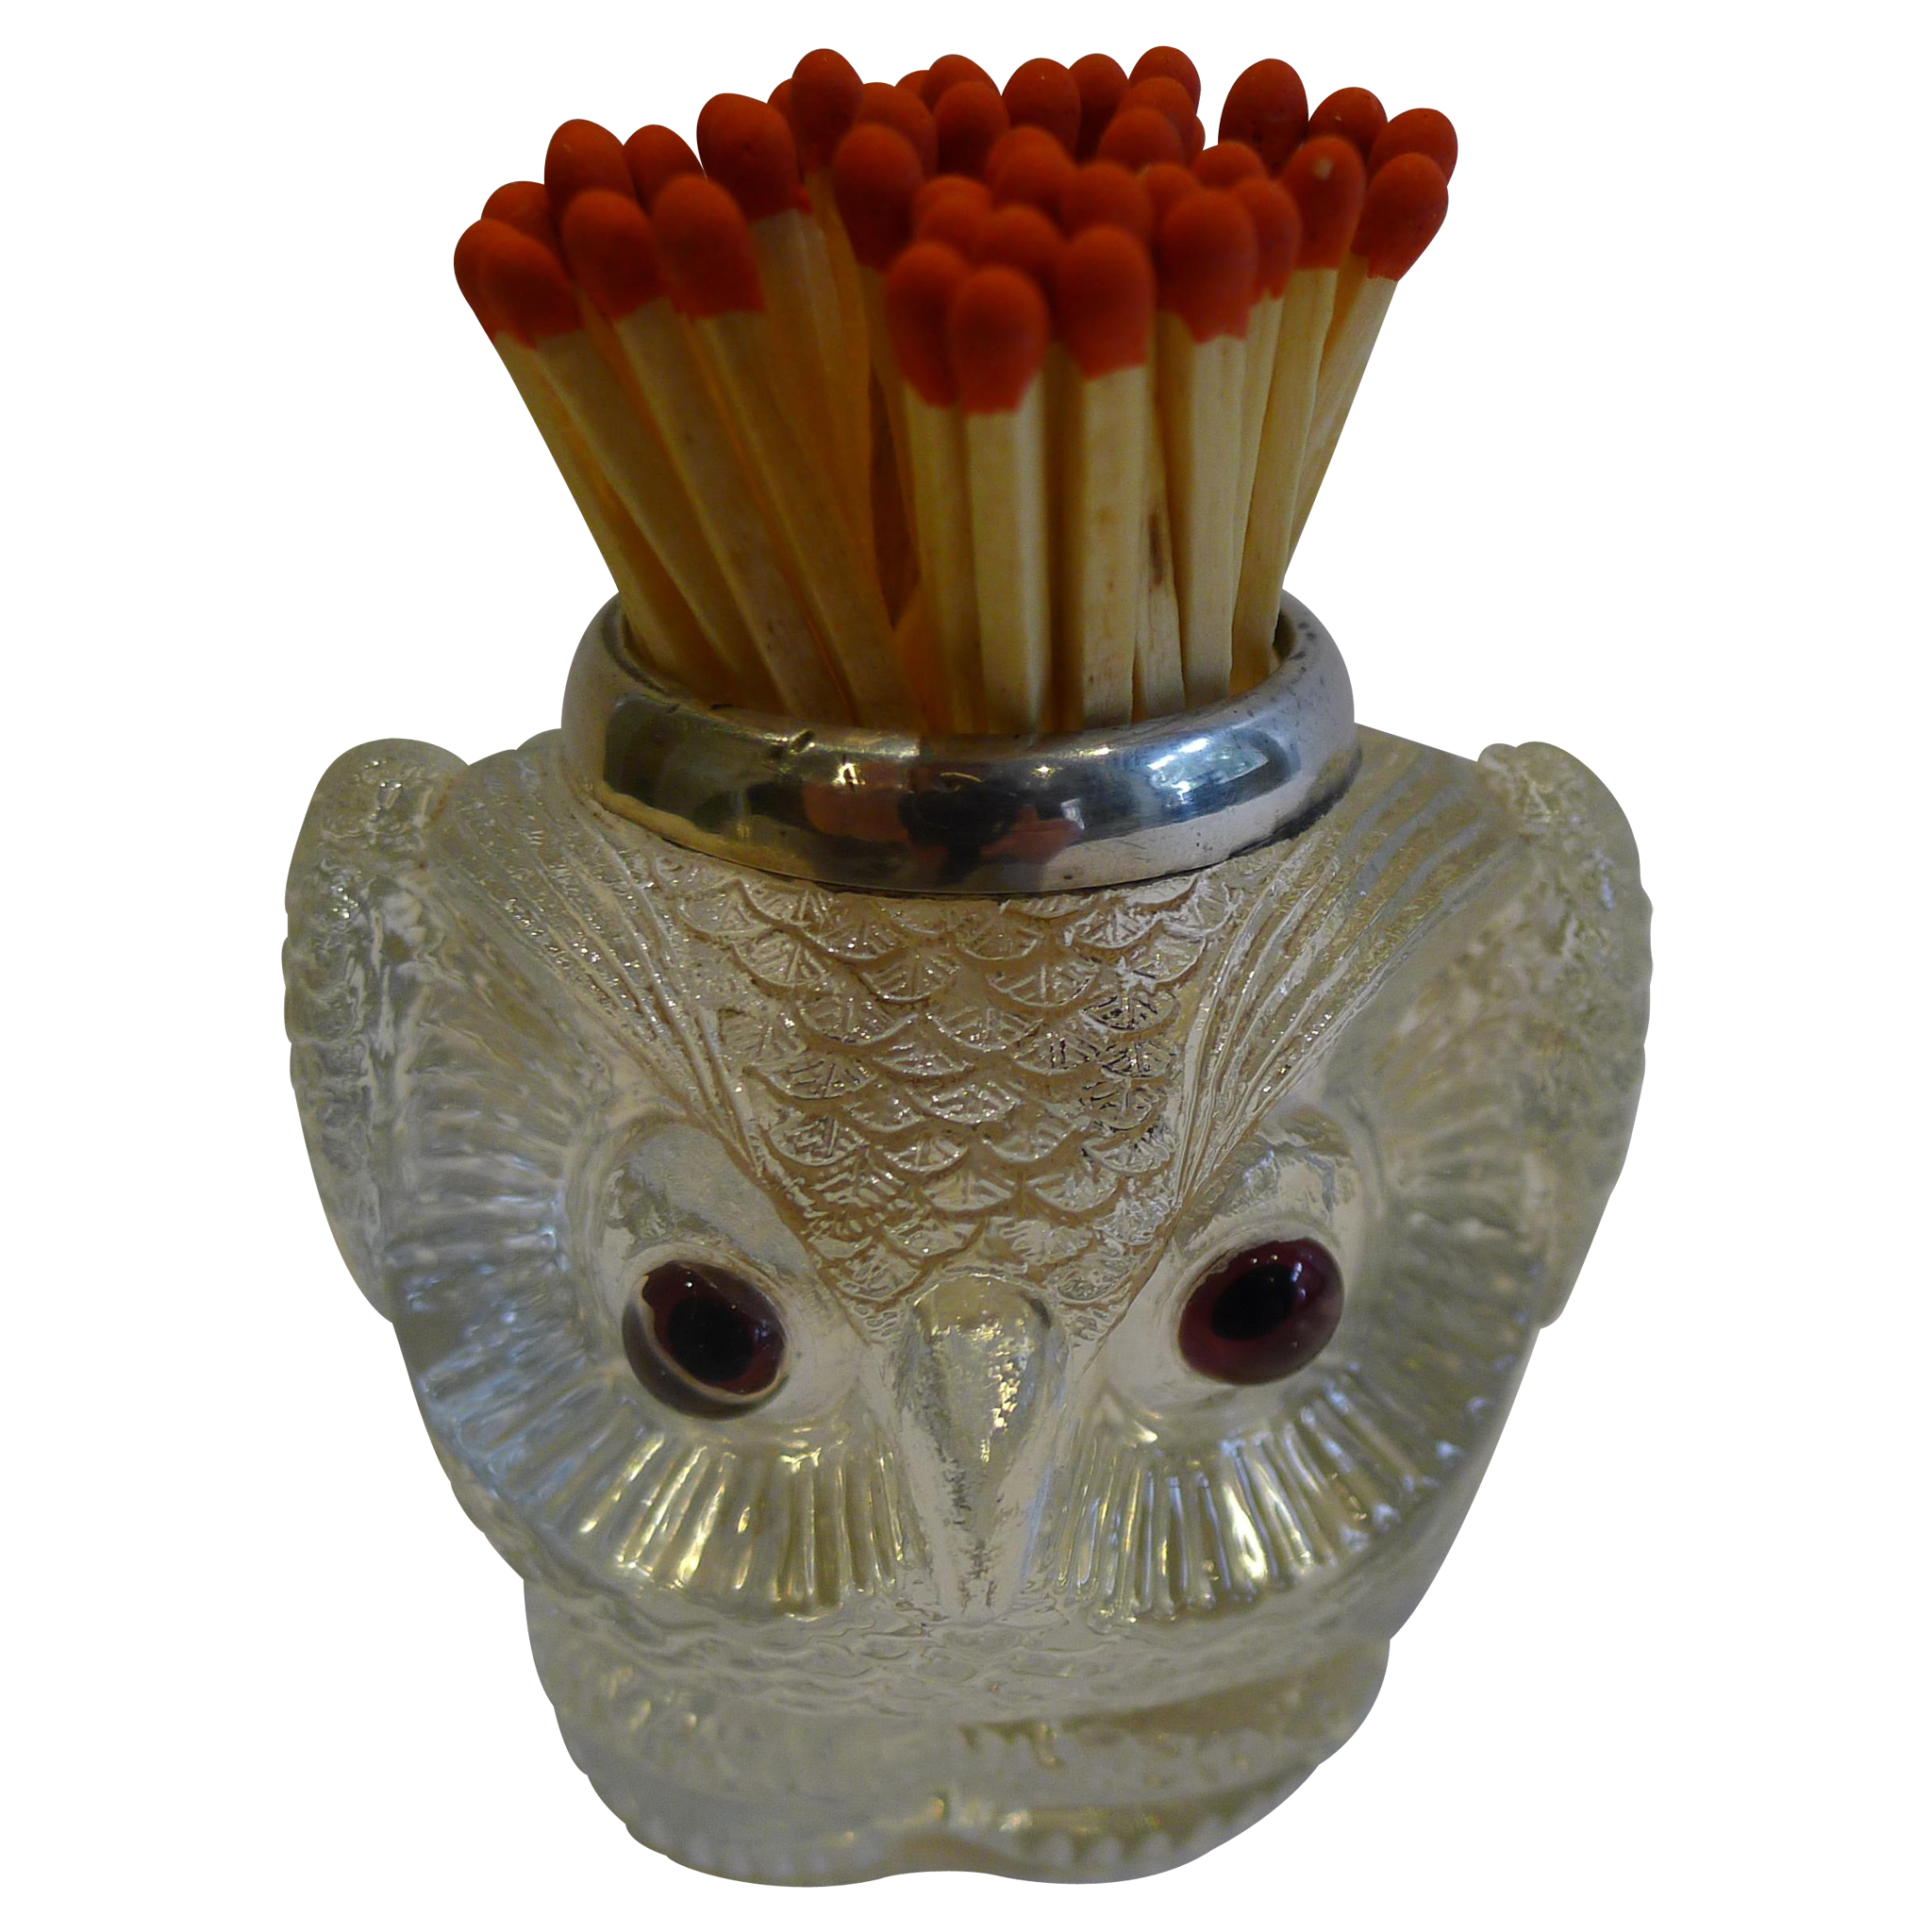 Rare Antique English Figural Match Strike - Owl